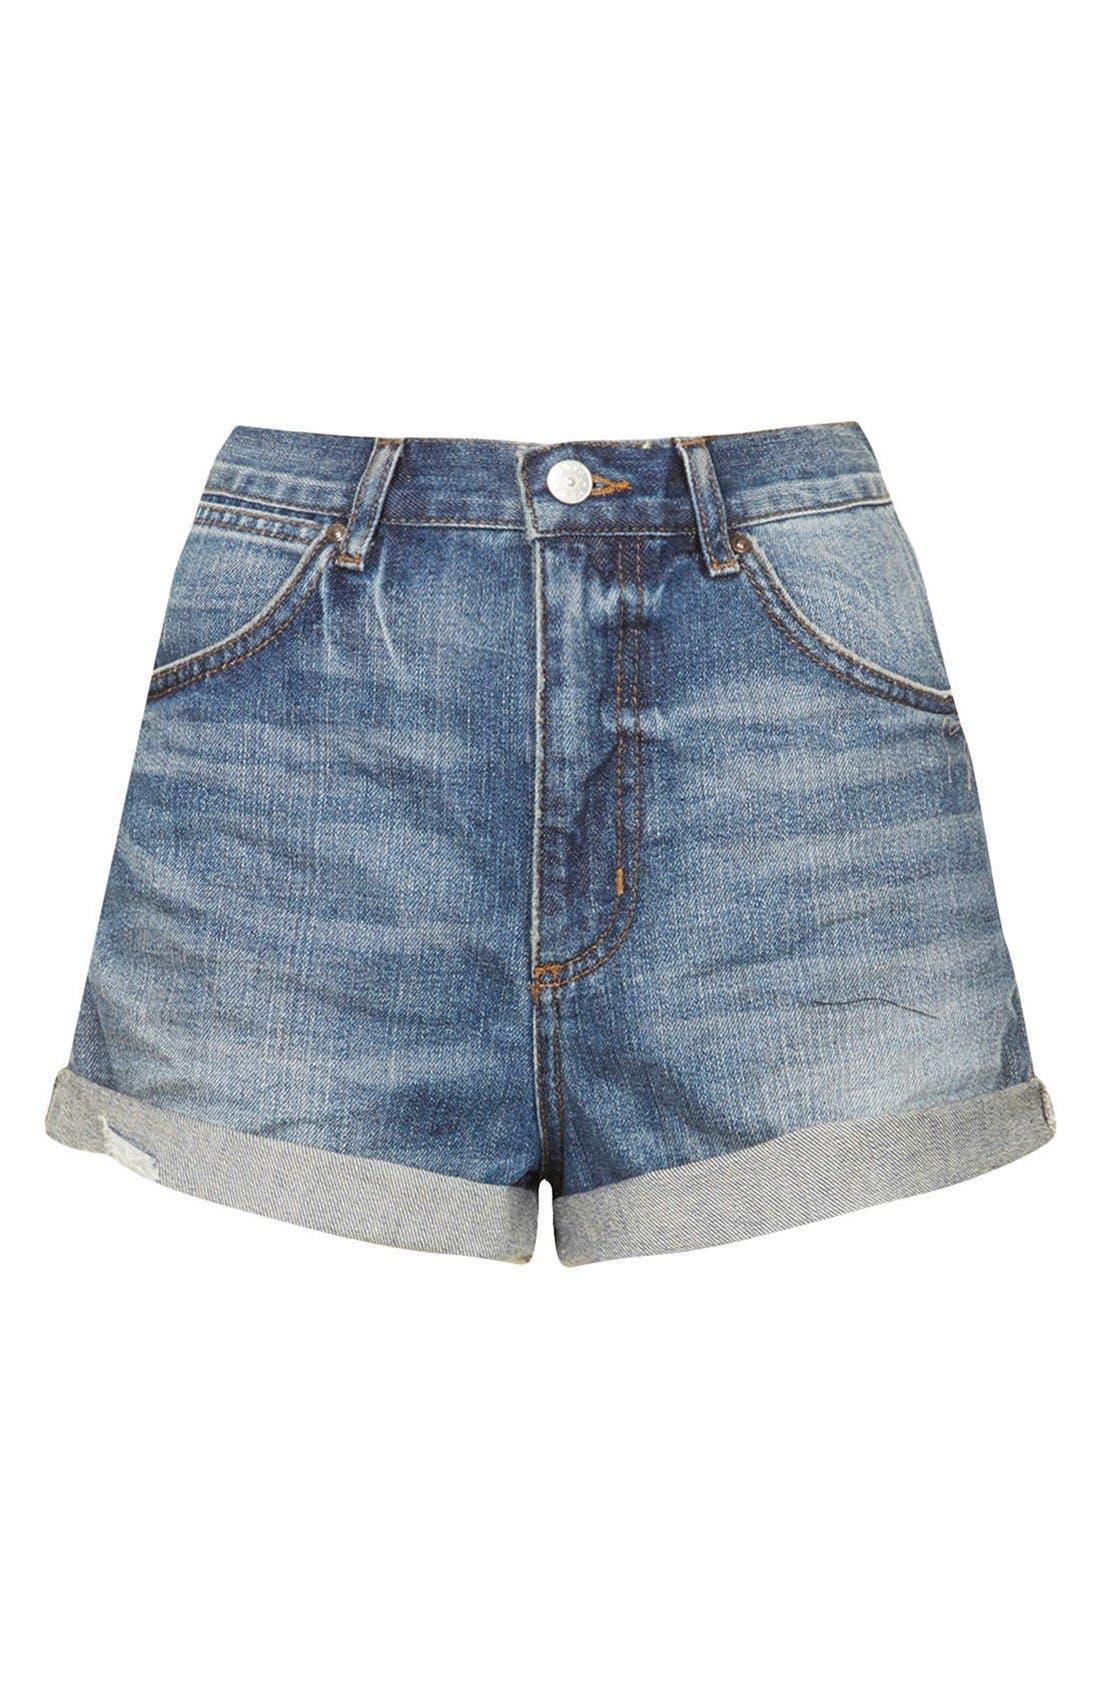 Alternate Image 3  - Topshop Moto 'Rosa' High Rise Denim Shorts (Mid Stone)